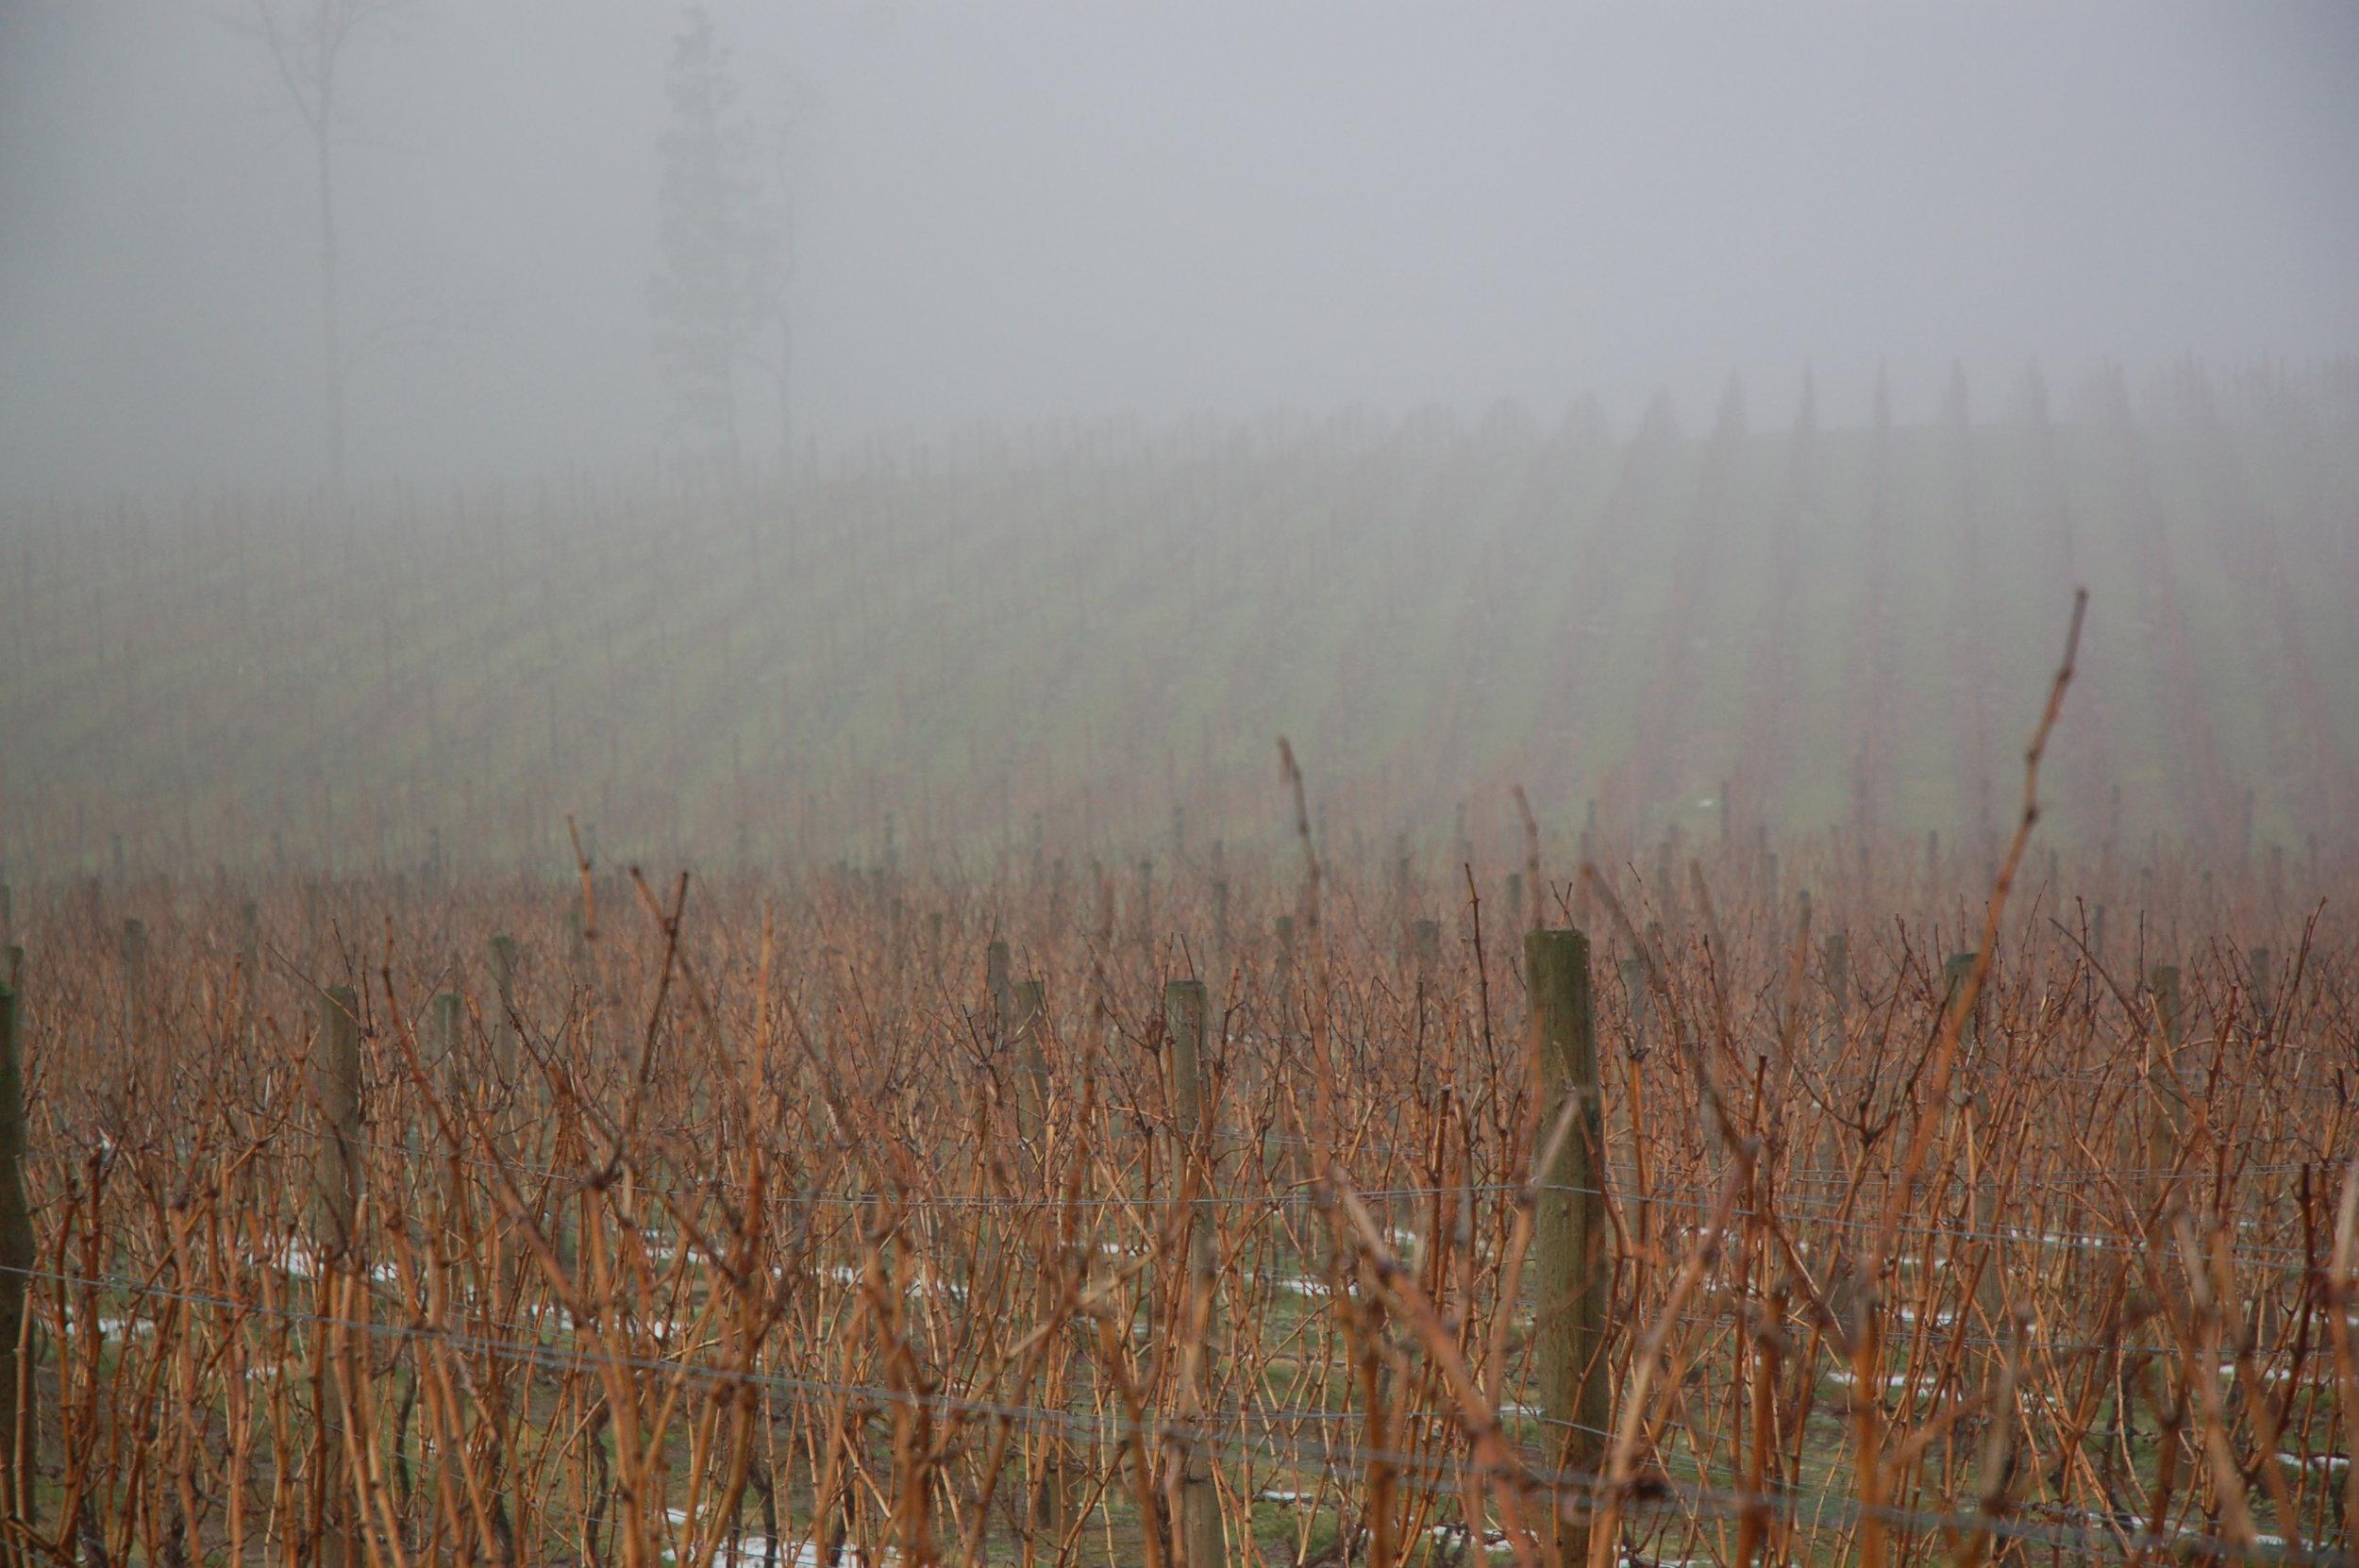 Alba Vineyard & Winery- Hillside Pinot Noir, Chardonnay